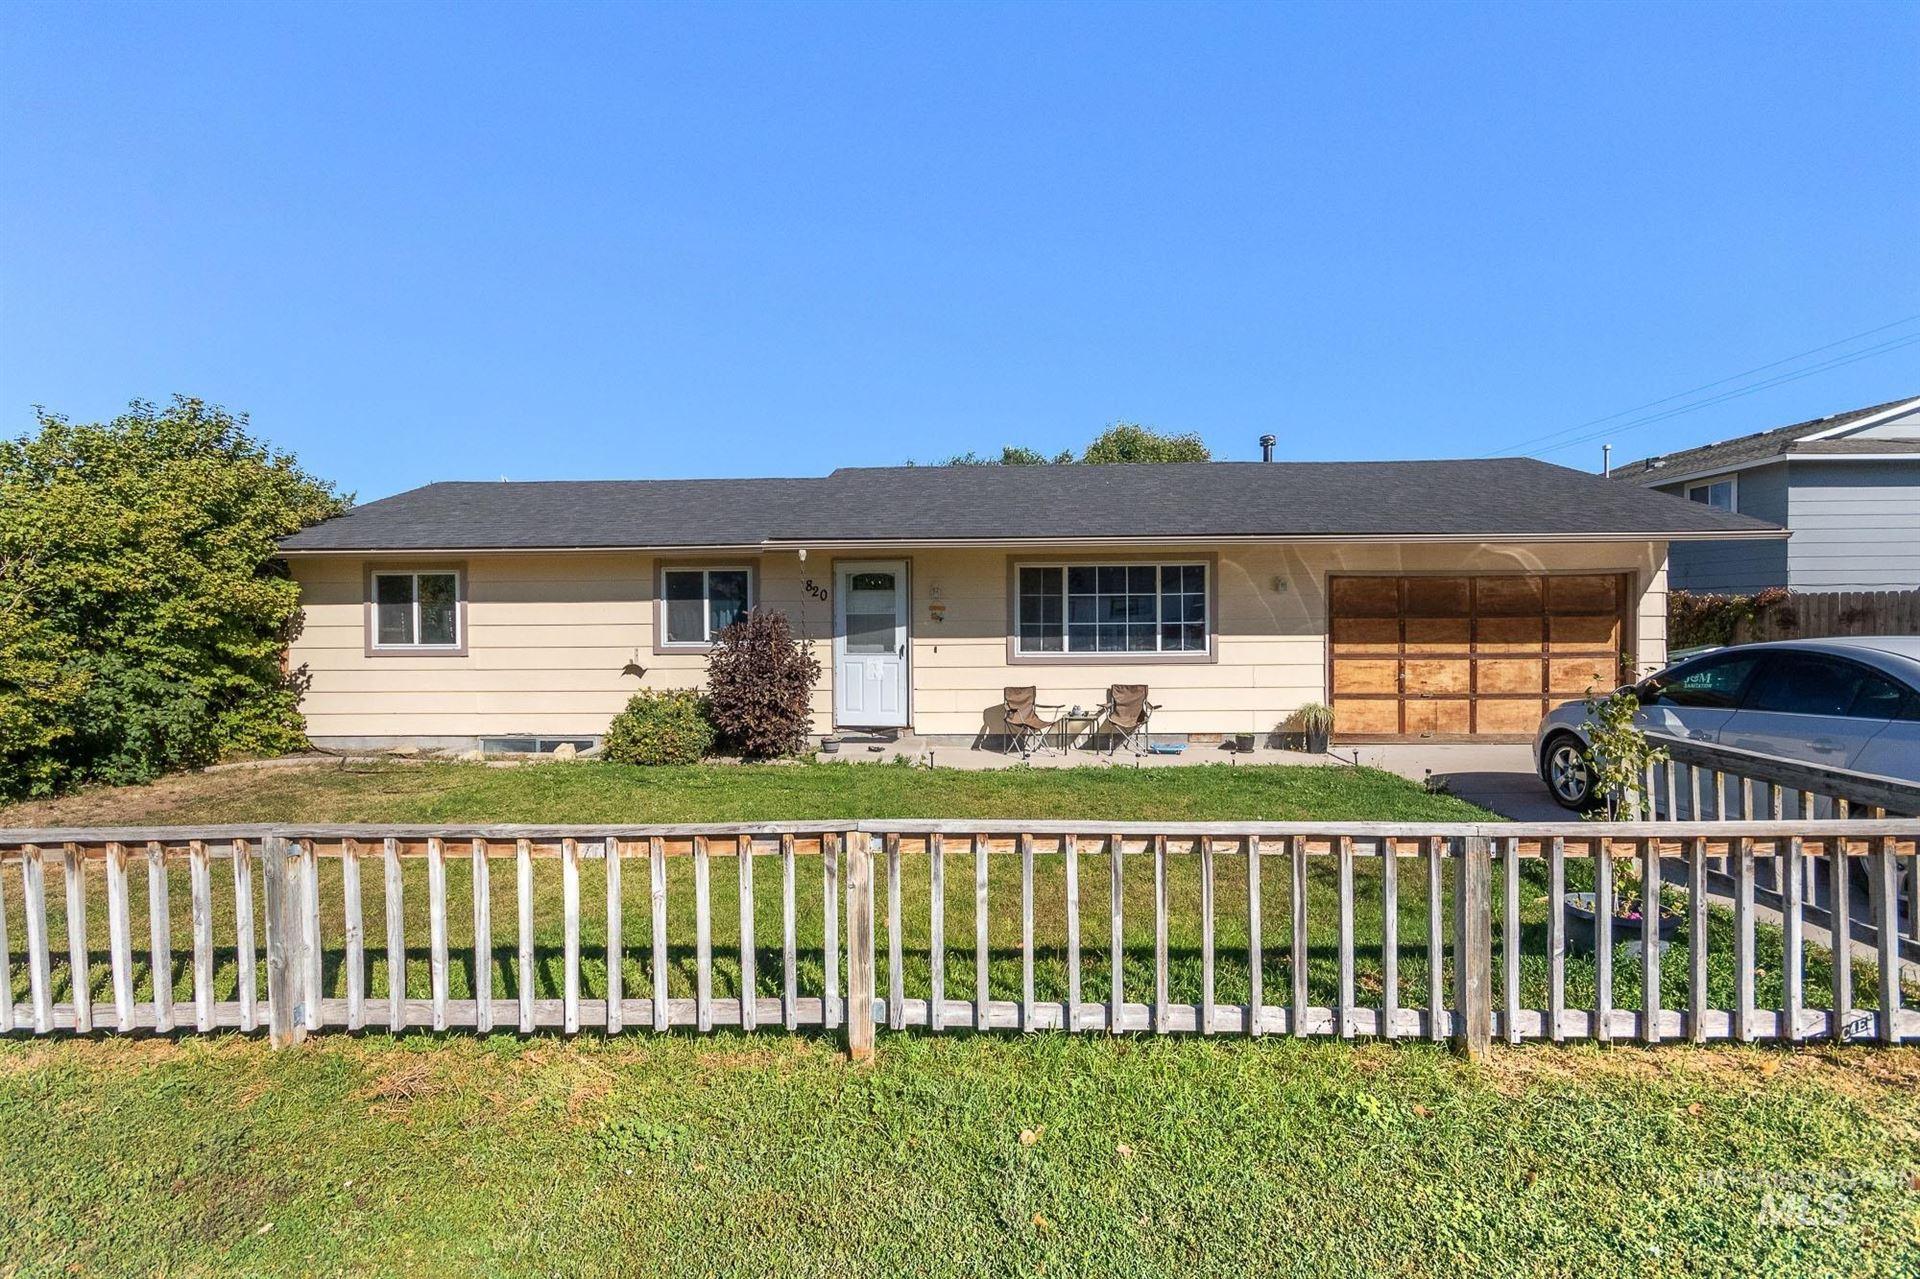 Photo of 820 N School Ave, Kuna, ID 83634-1810 (MLS # 98819350)